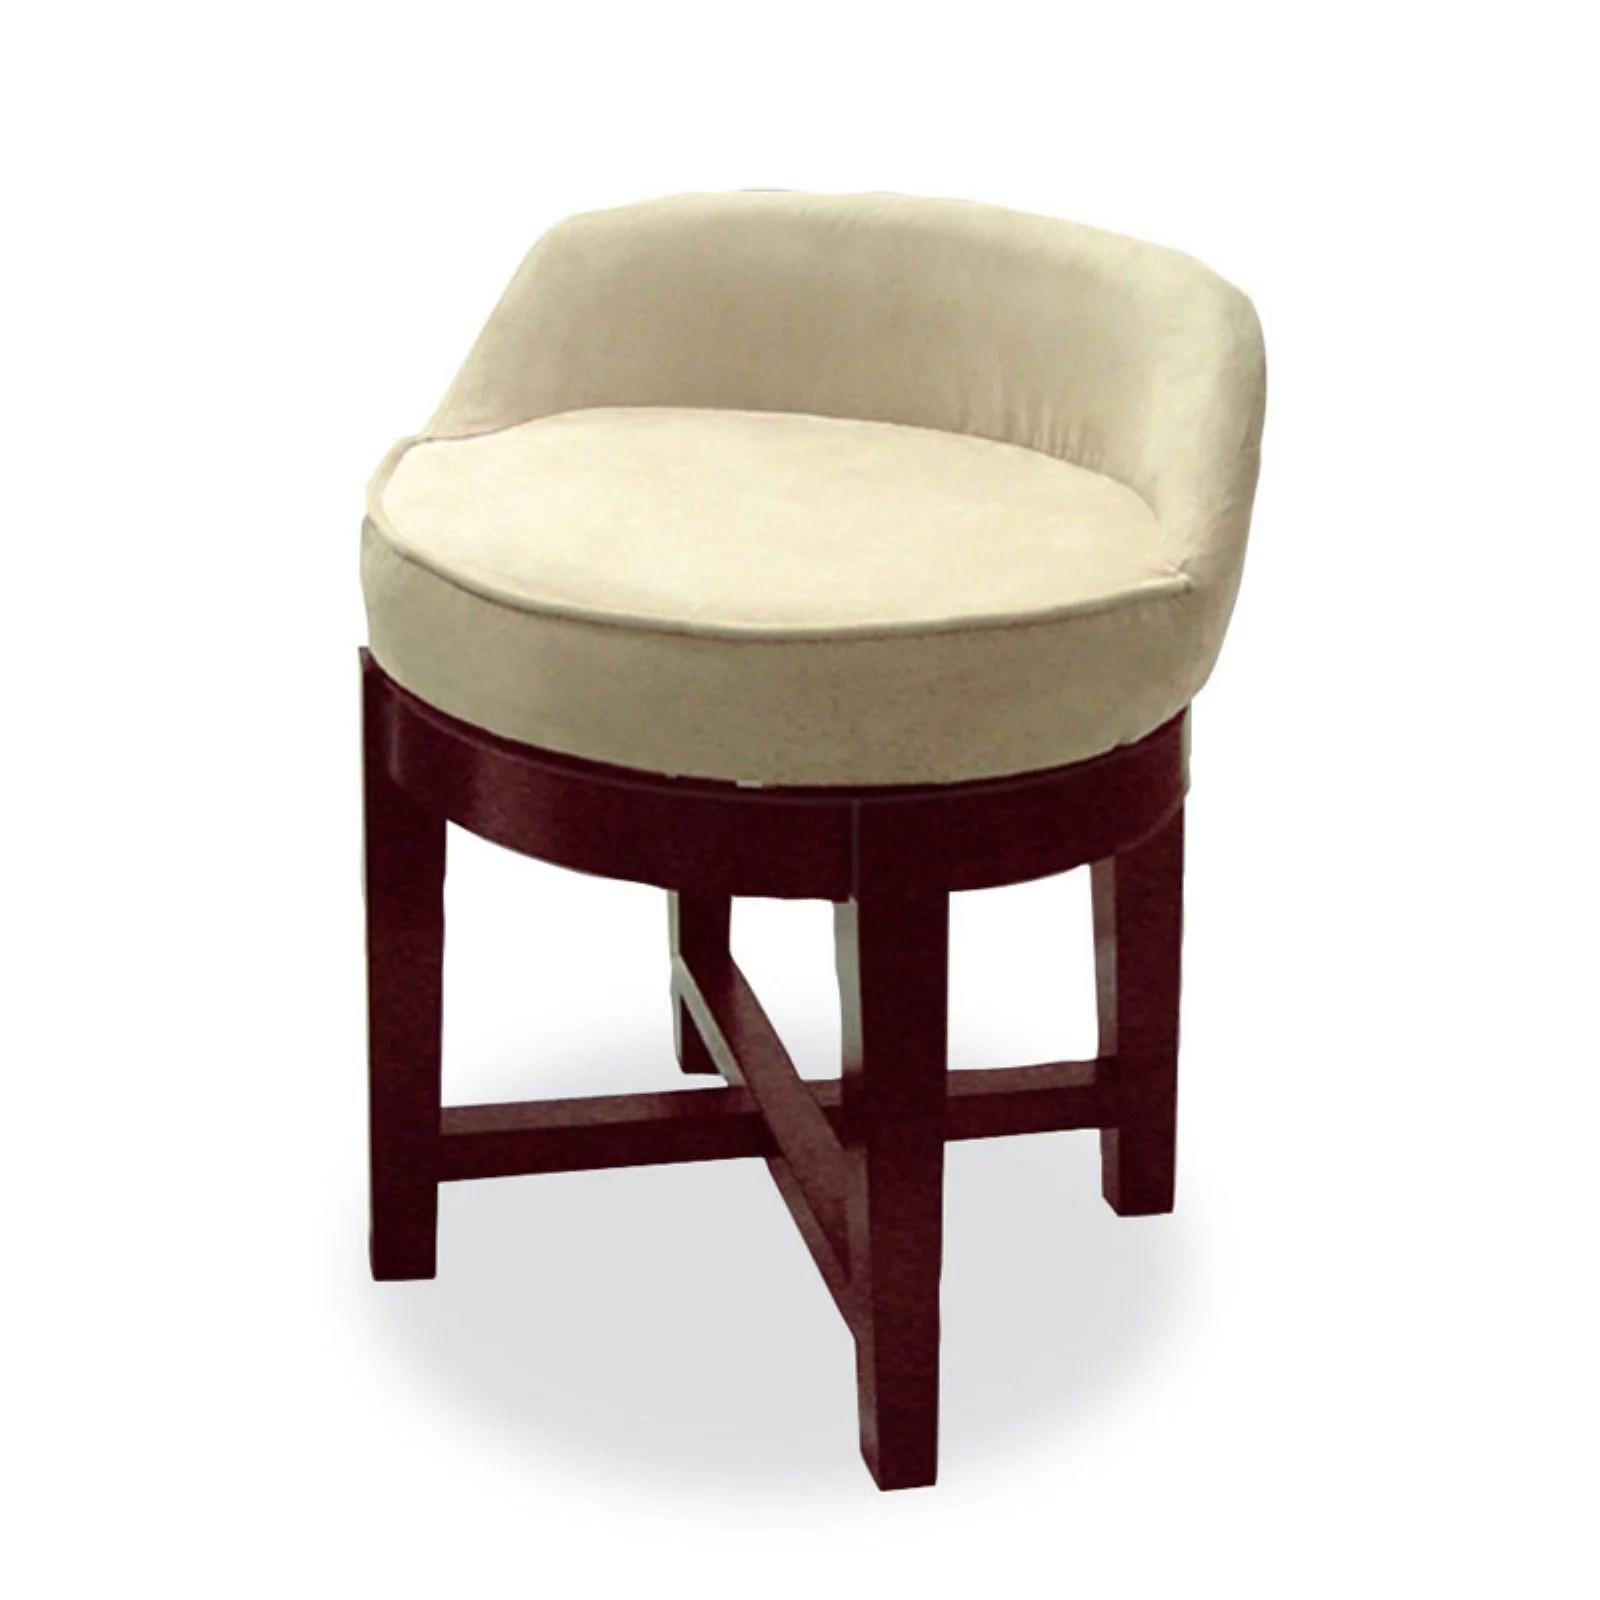 swivel upholstered chairs chair steel legs vanity walmart com